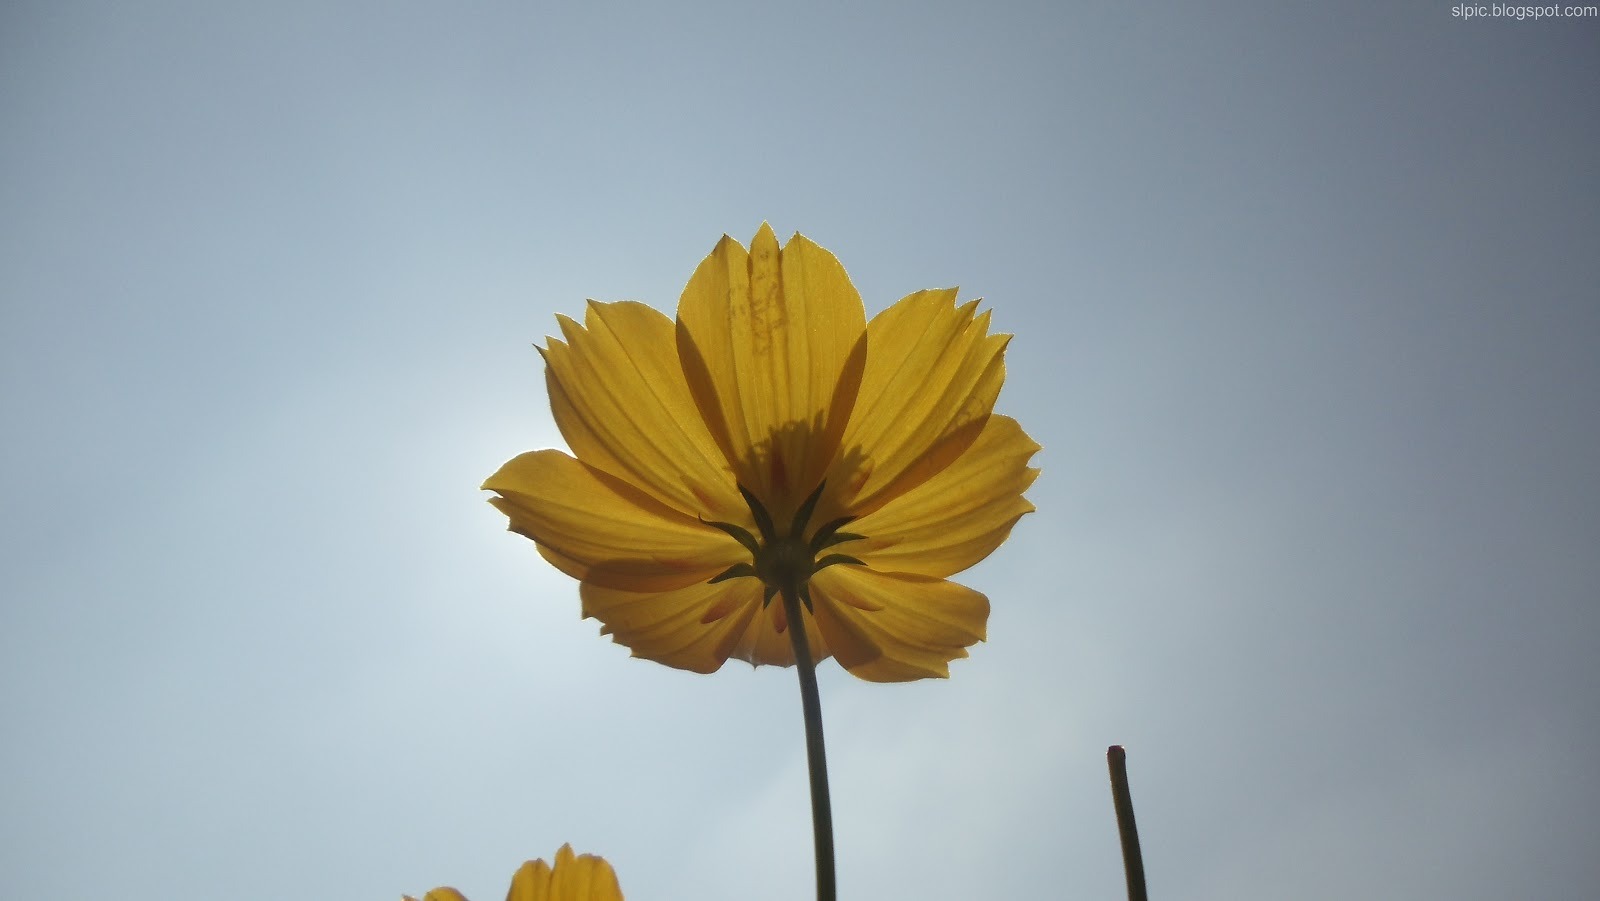 http://3.bp.blogspot.com/-XkkOeXQnCHo/UBIn7oVXbDI/AAAAAAAAKlY/fLL3ZvtMO50/s1600/Srilanka+Various+Flowers+And+Nature++(8).JPG